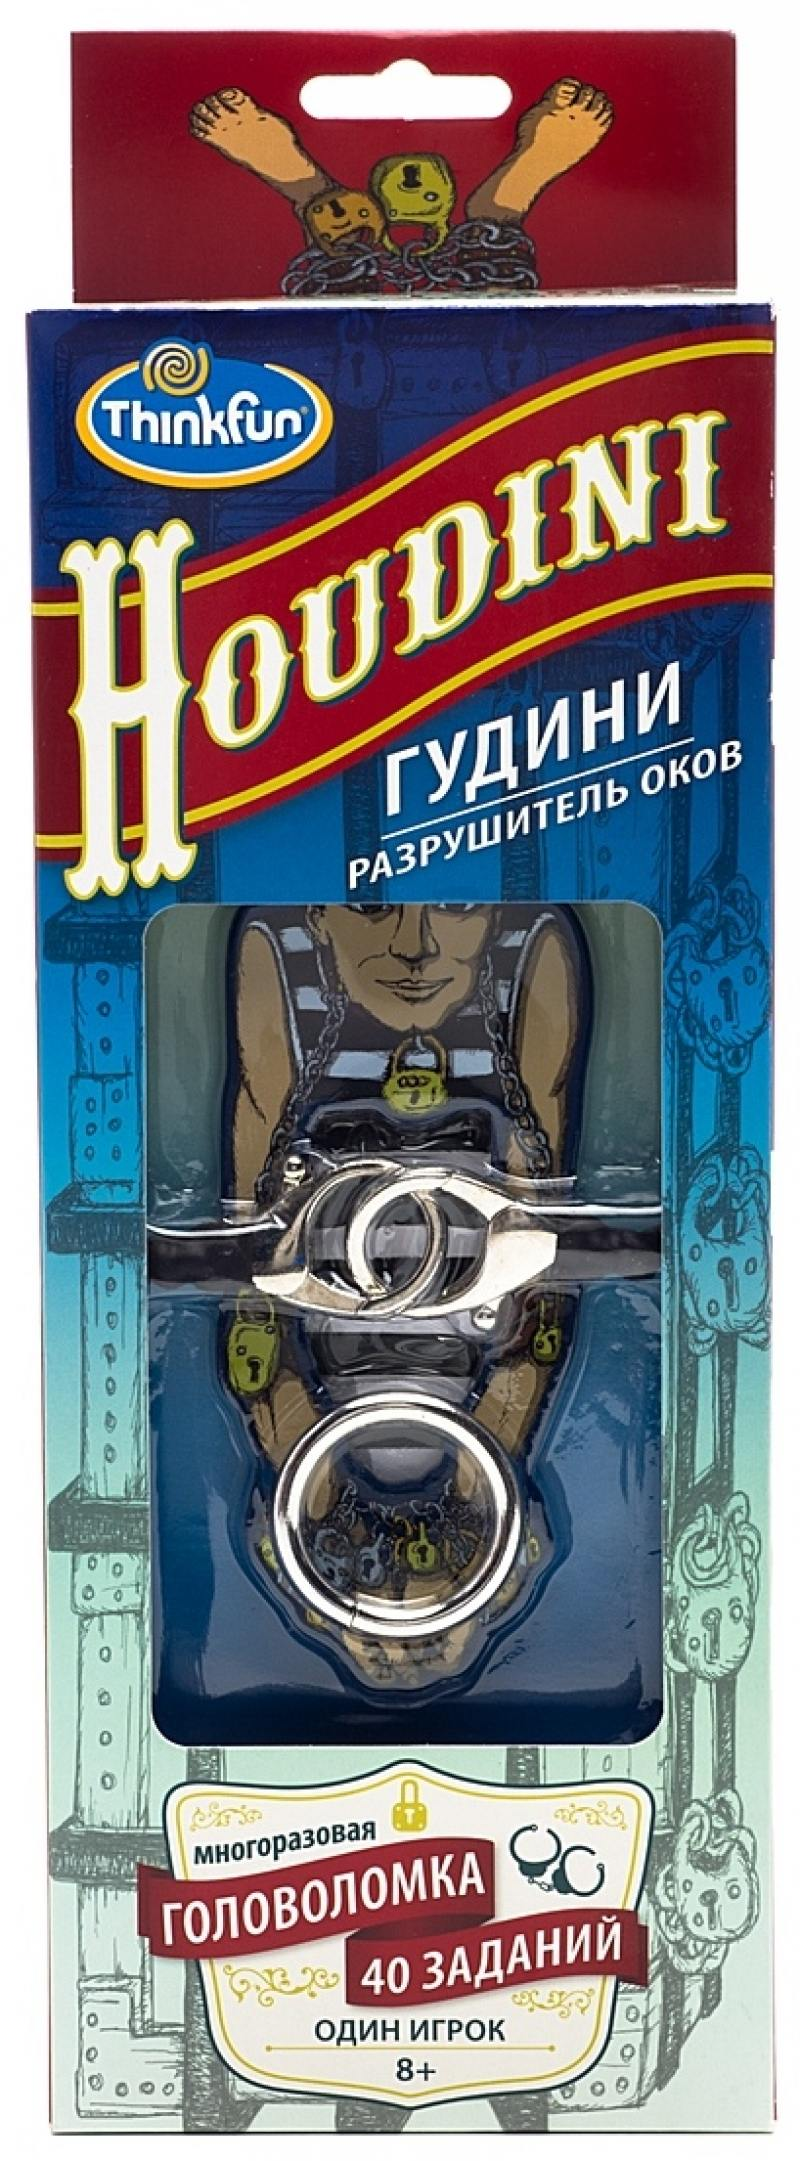 Гудини Разрушитель оков 7300-RU головоломка thinkfun гудини разрушитель оков 7300 ru